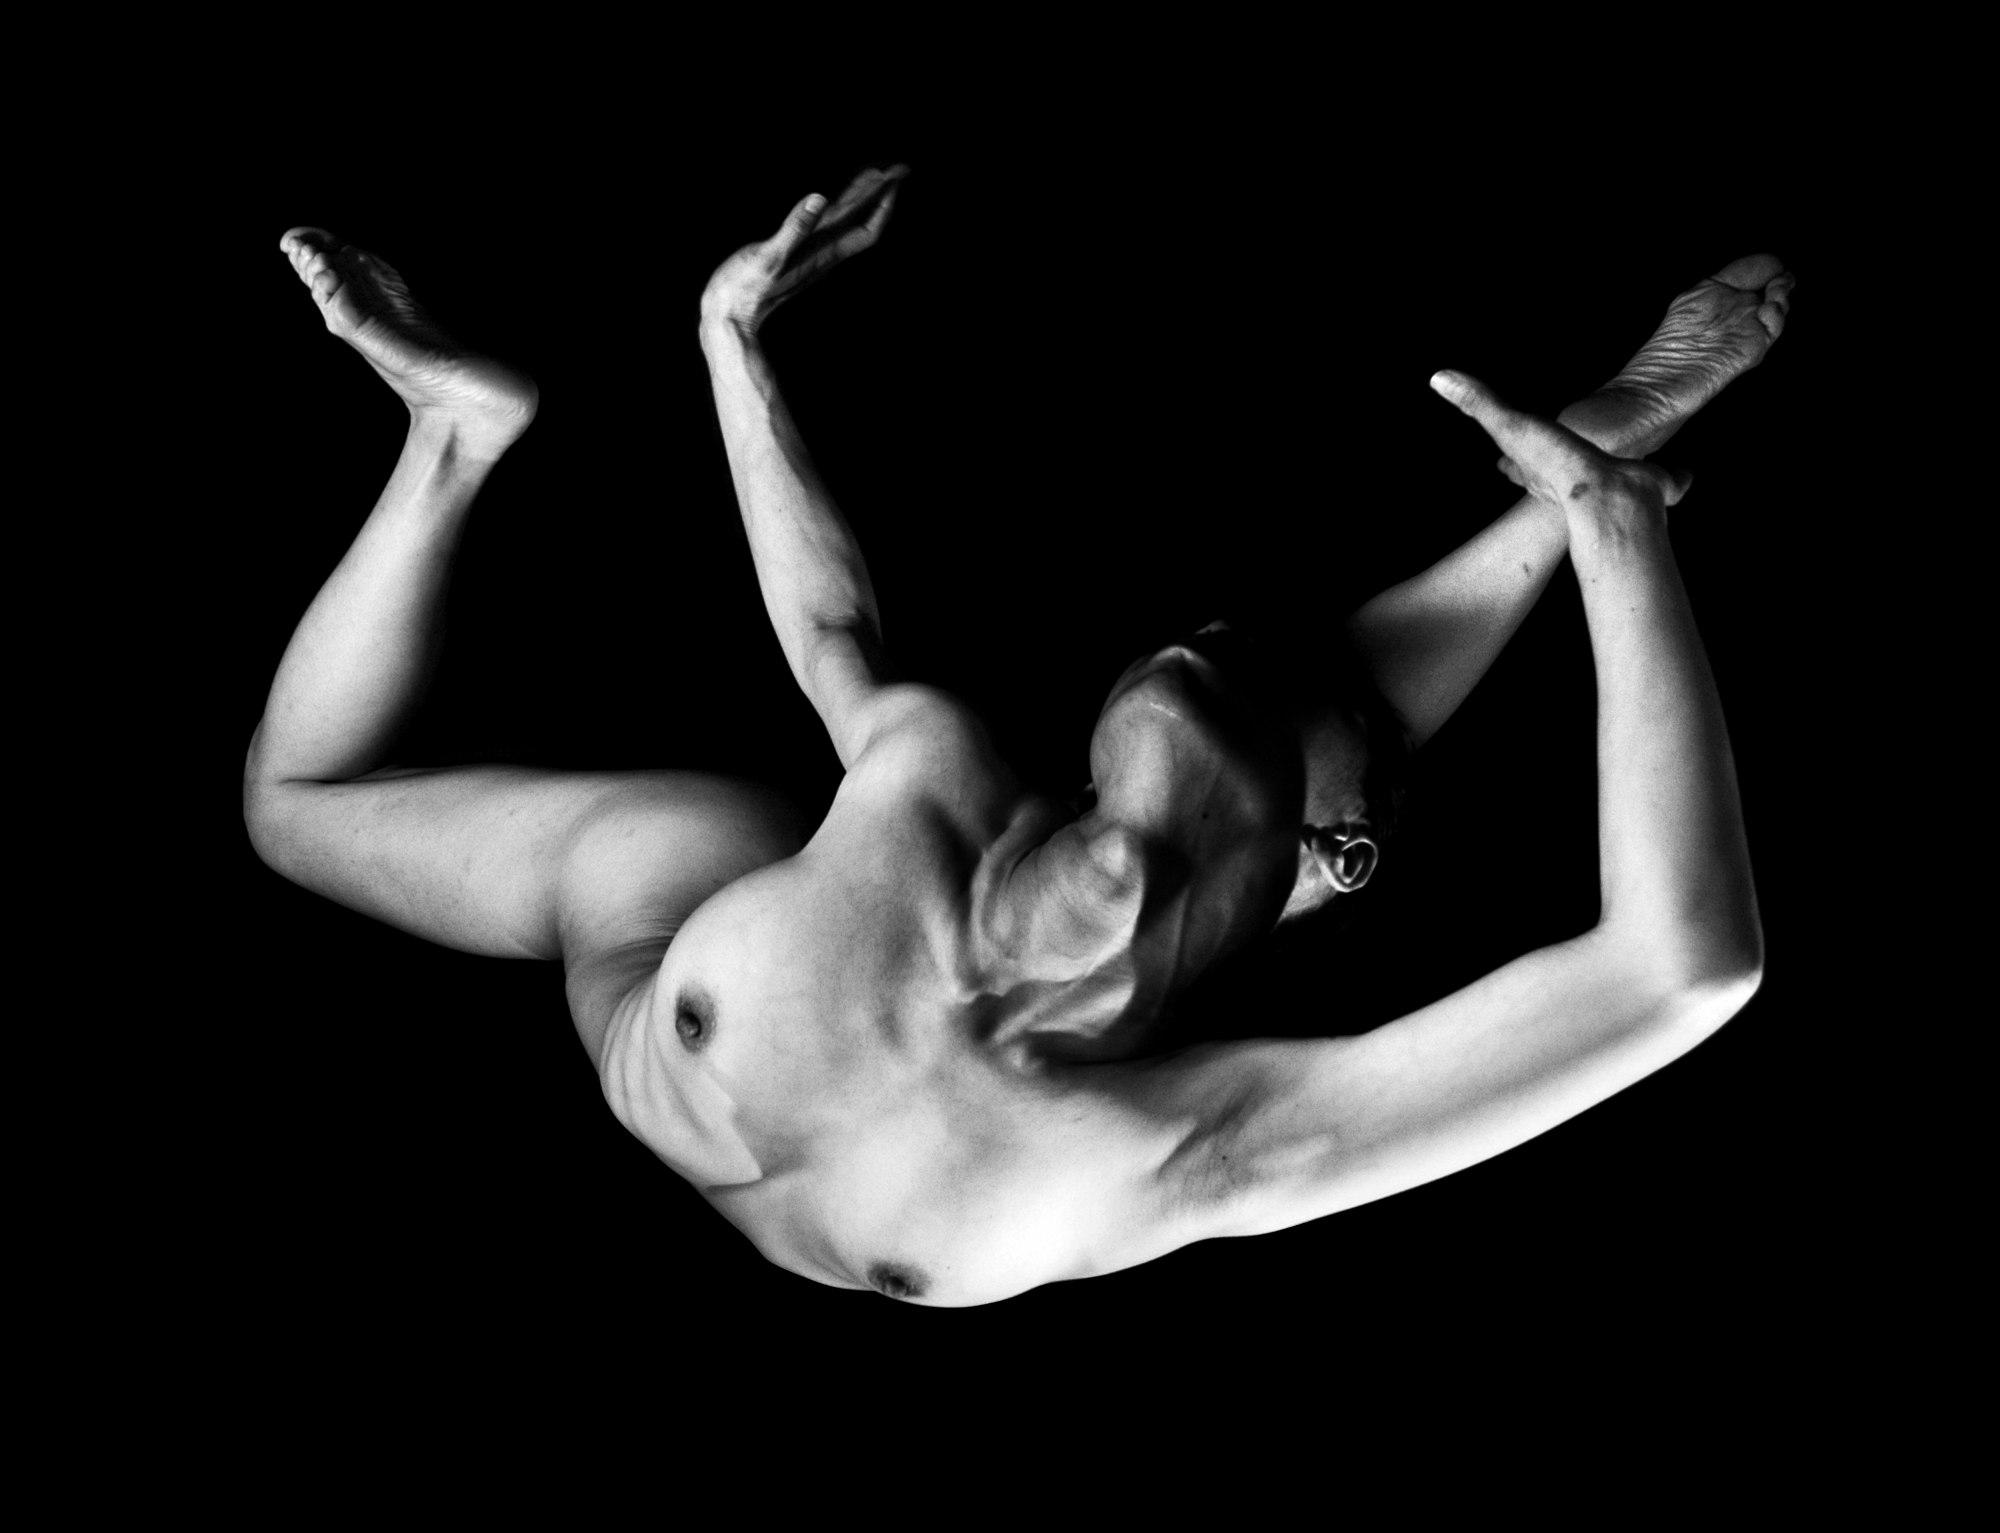 2011 / Falling / 90x60 cm / Photo by Suelynee 何書伶